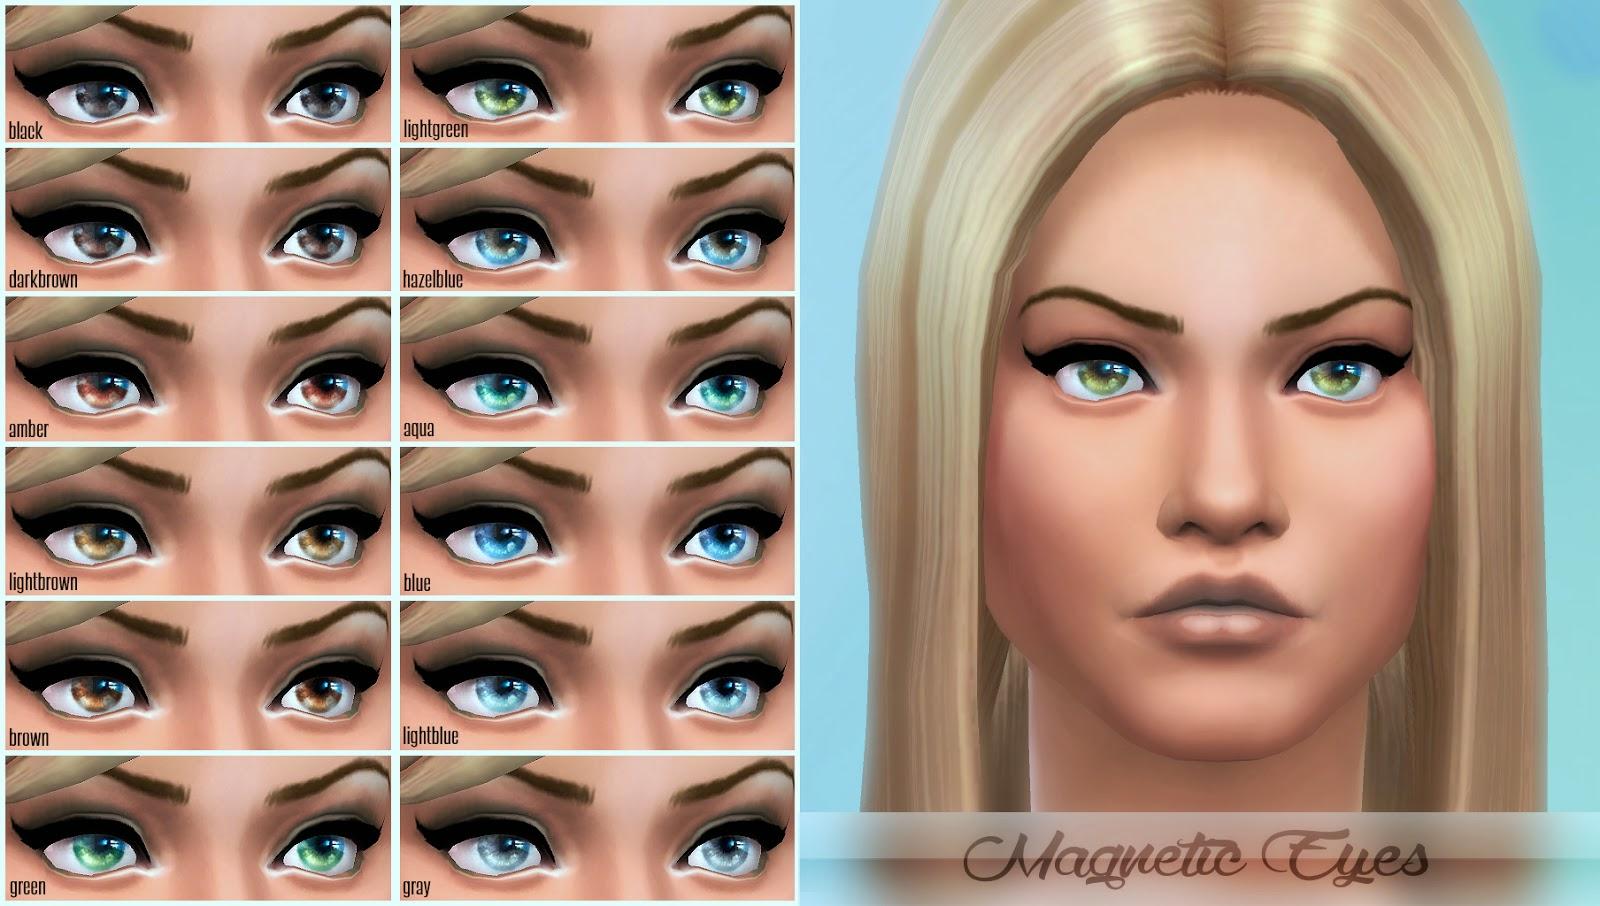 Sims 4 Custom Content Eyes